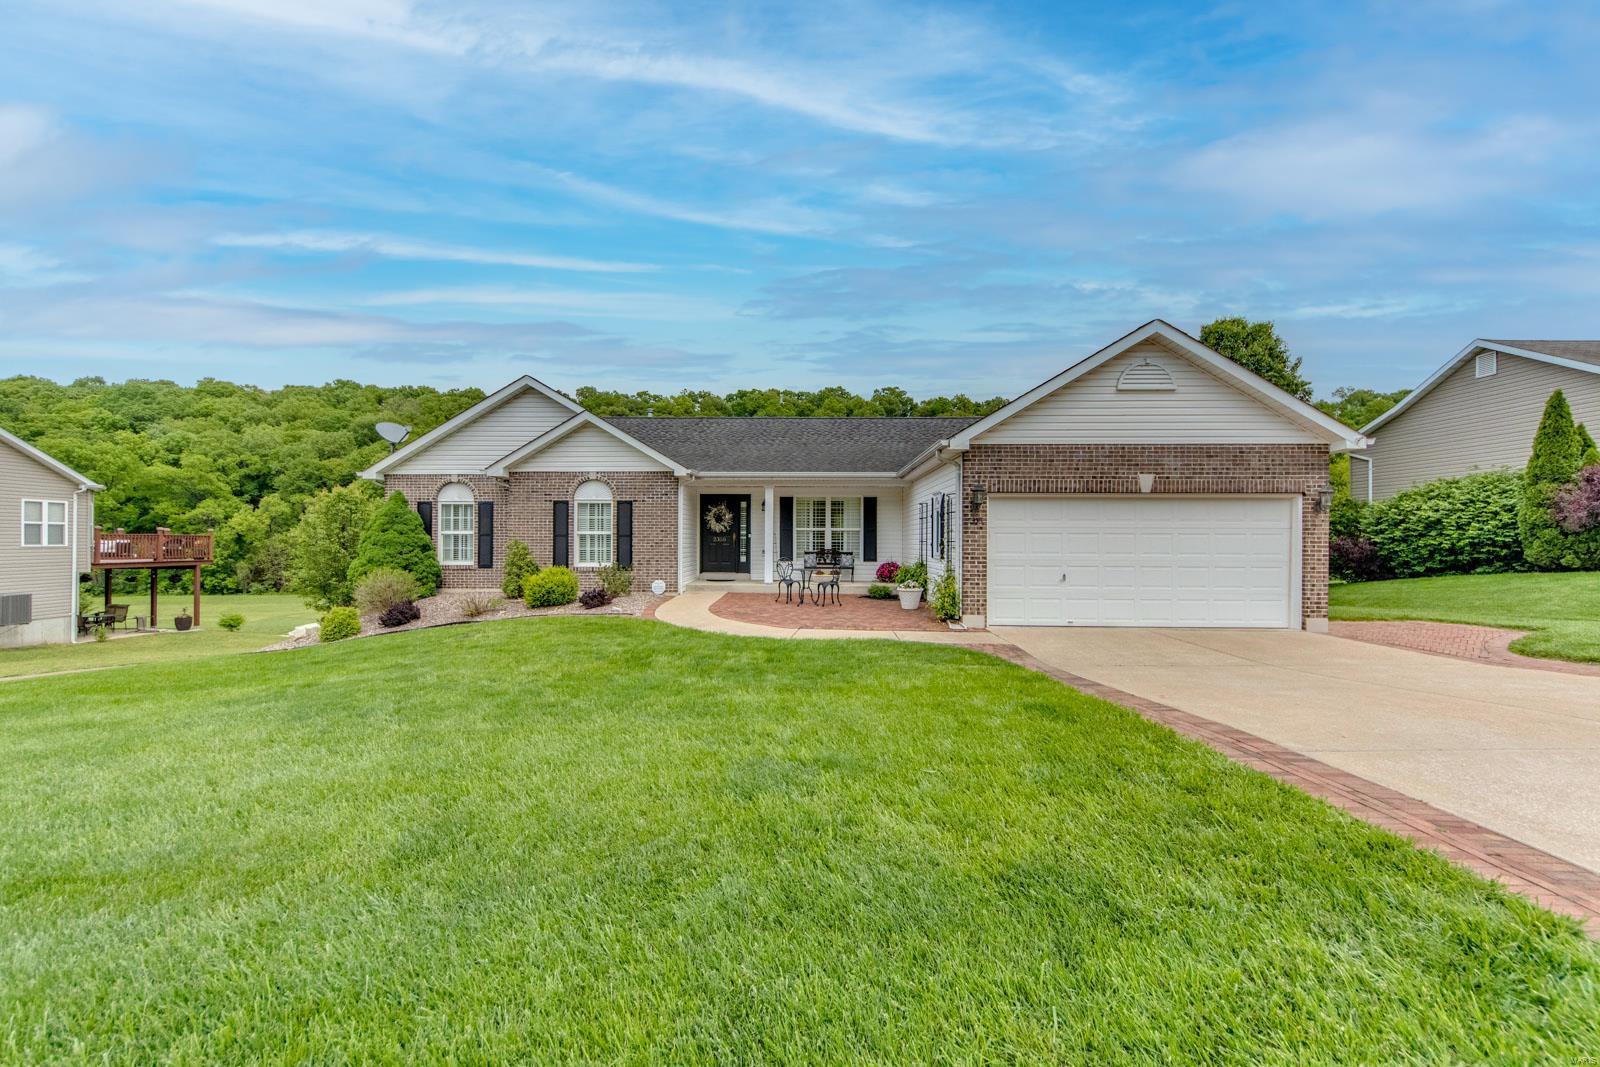 2358 Fairway Property Photo - High Ridge, MO real estate listing